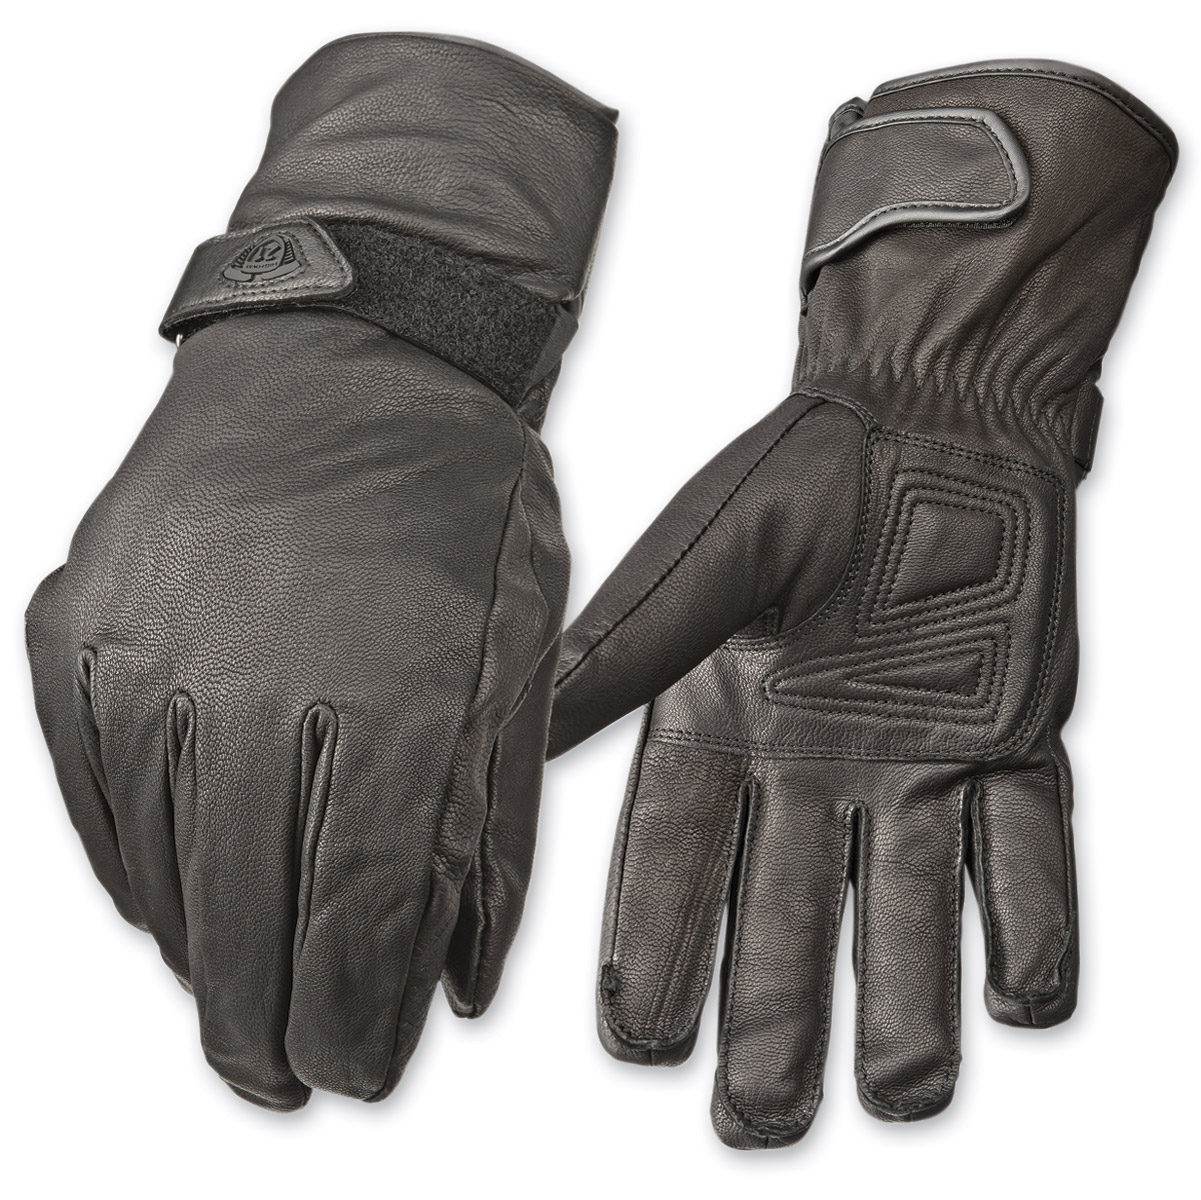 Highway 21 Men's Granite Black Leather Gloves